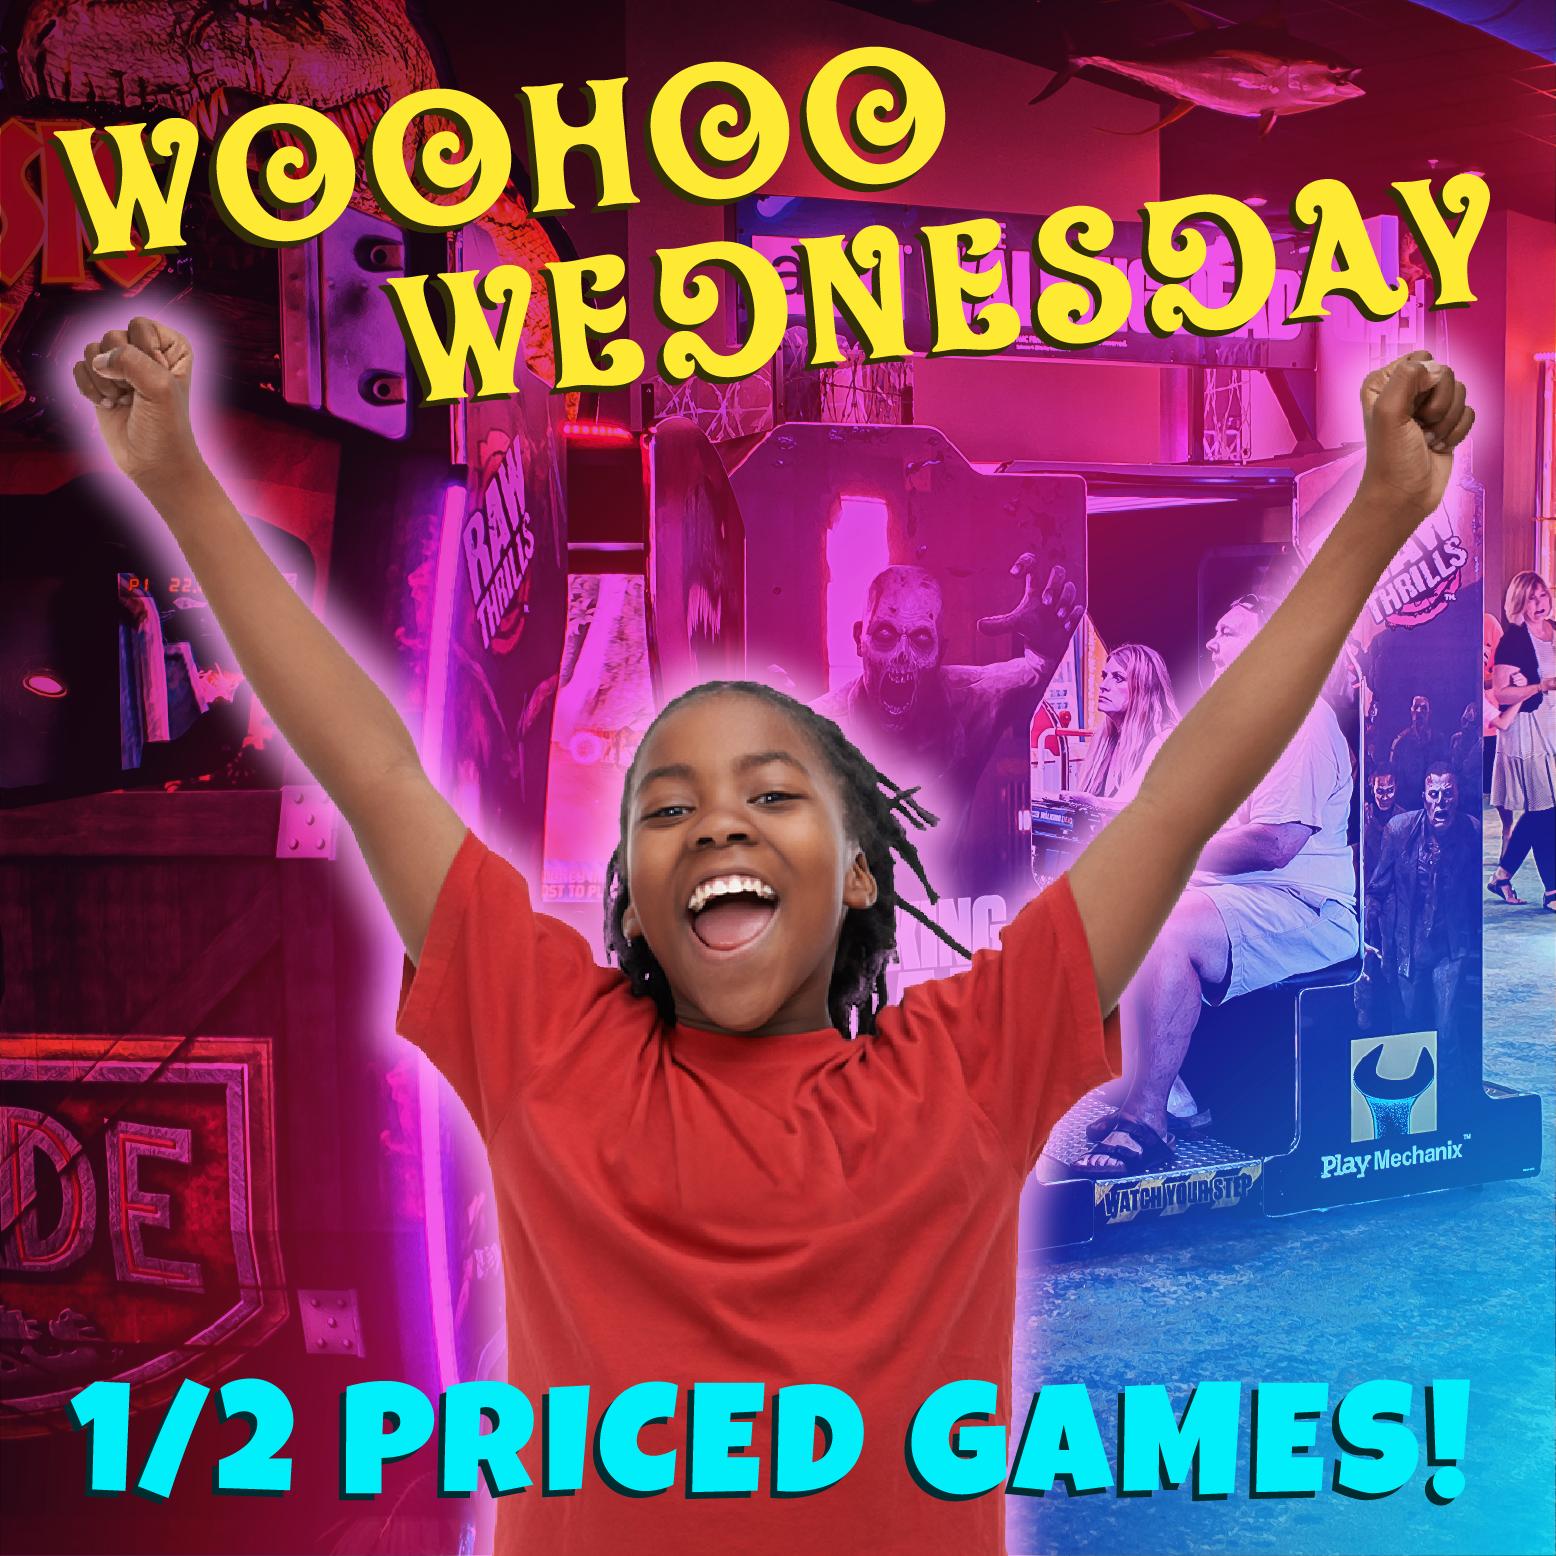 Half Priced Arcade Games on WooHoo Wednesday